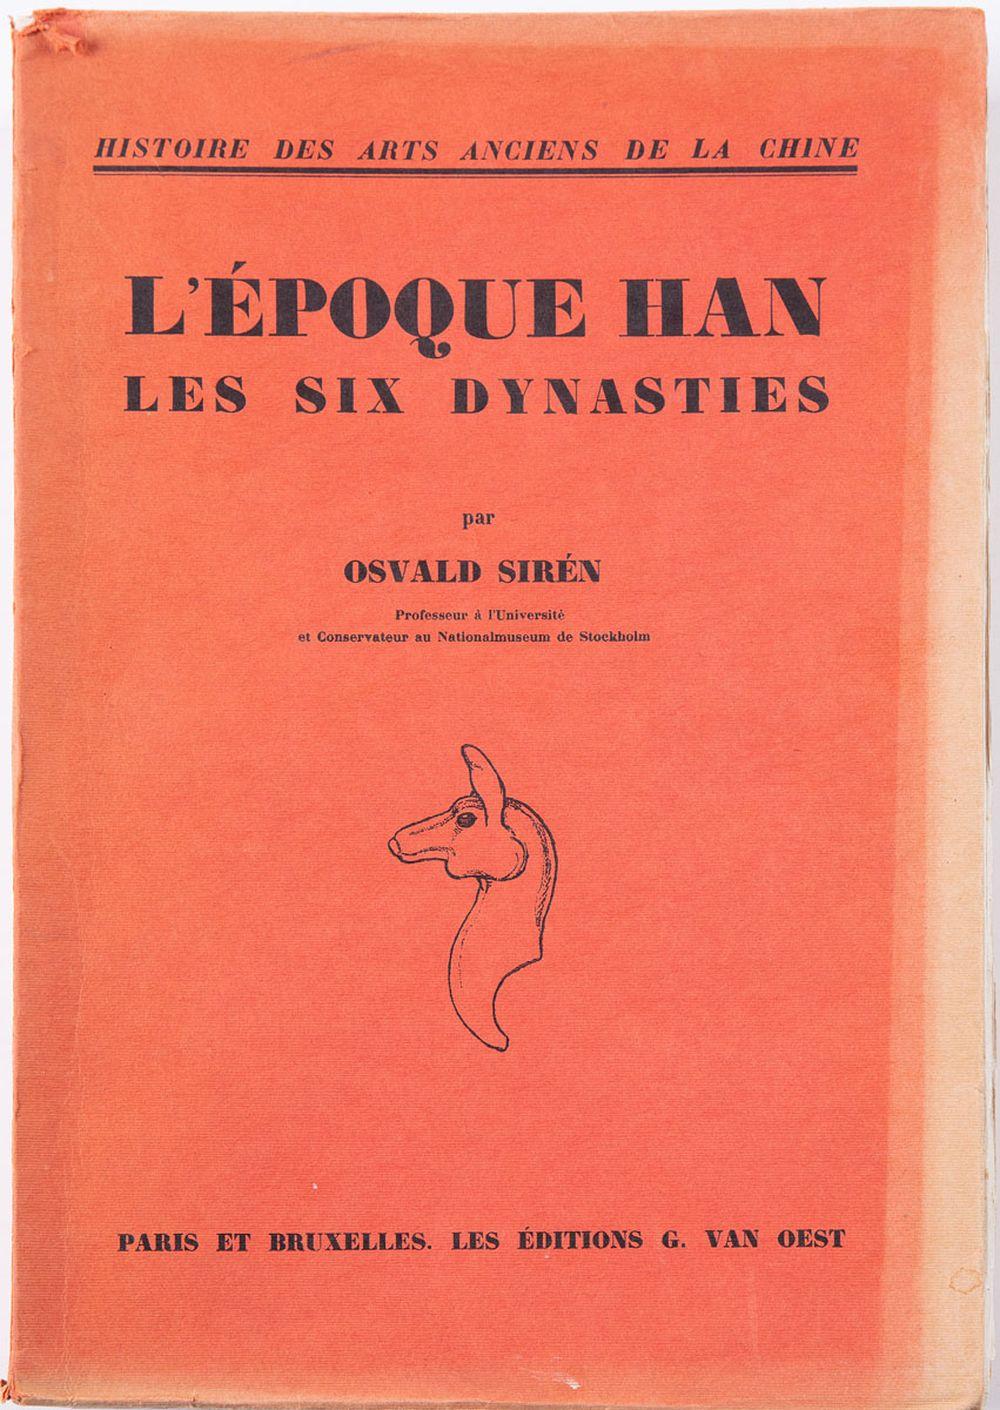 [CHINE] Osvald SIRÉN - Histoire des arts anciens de la